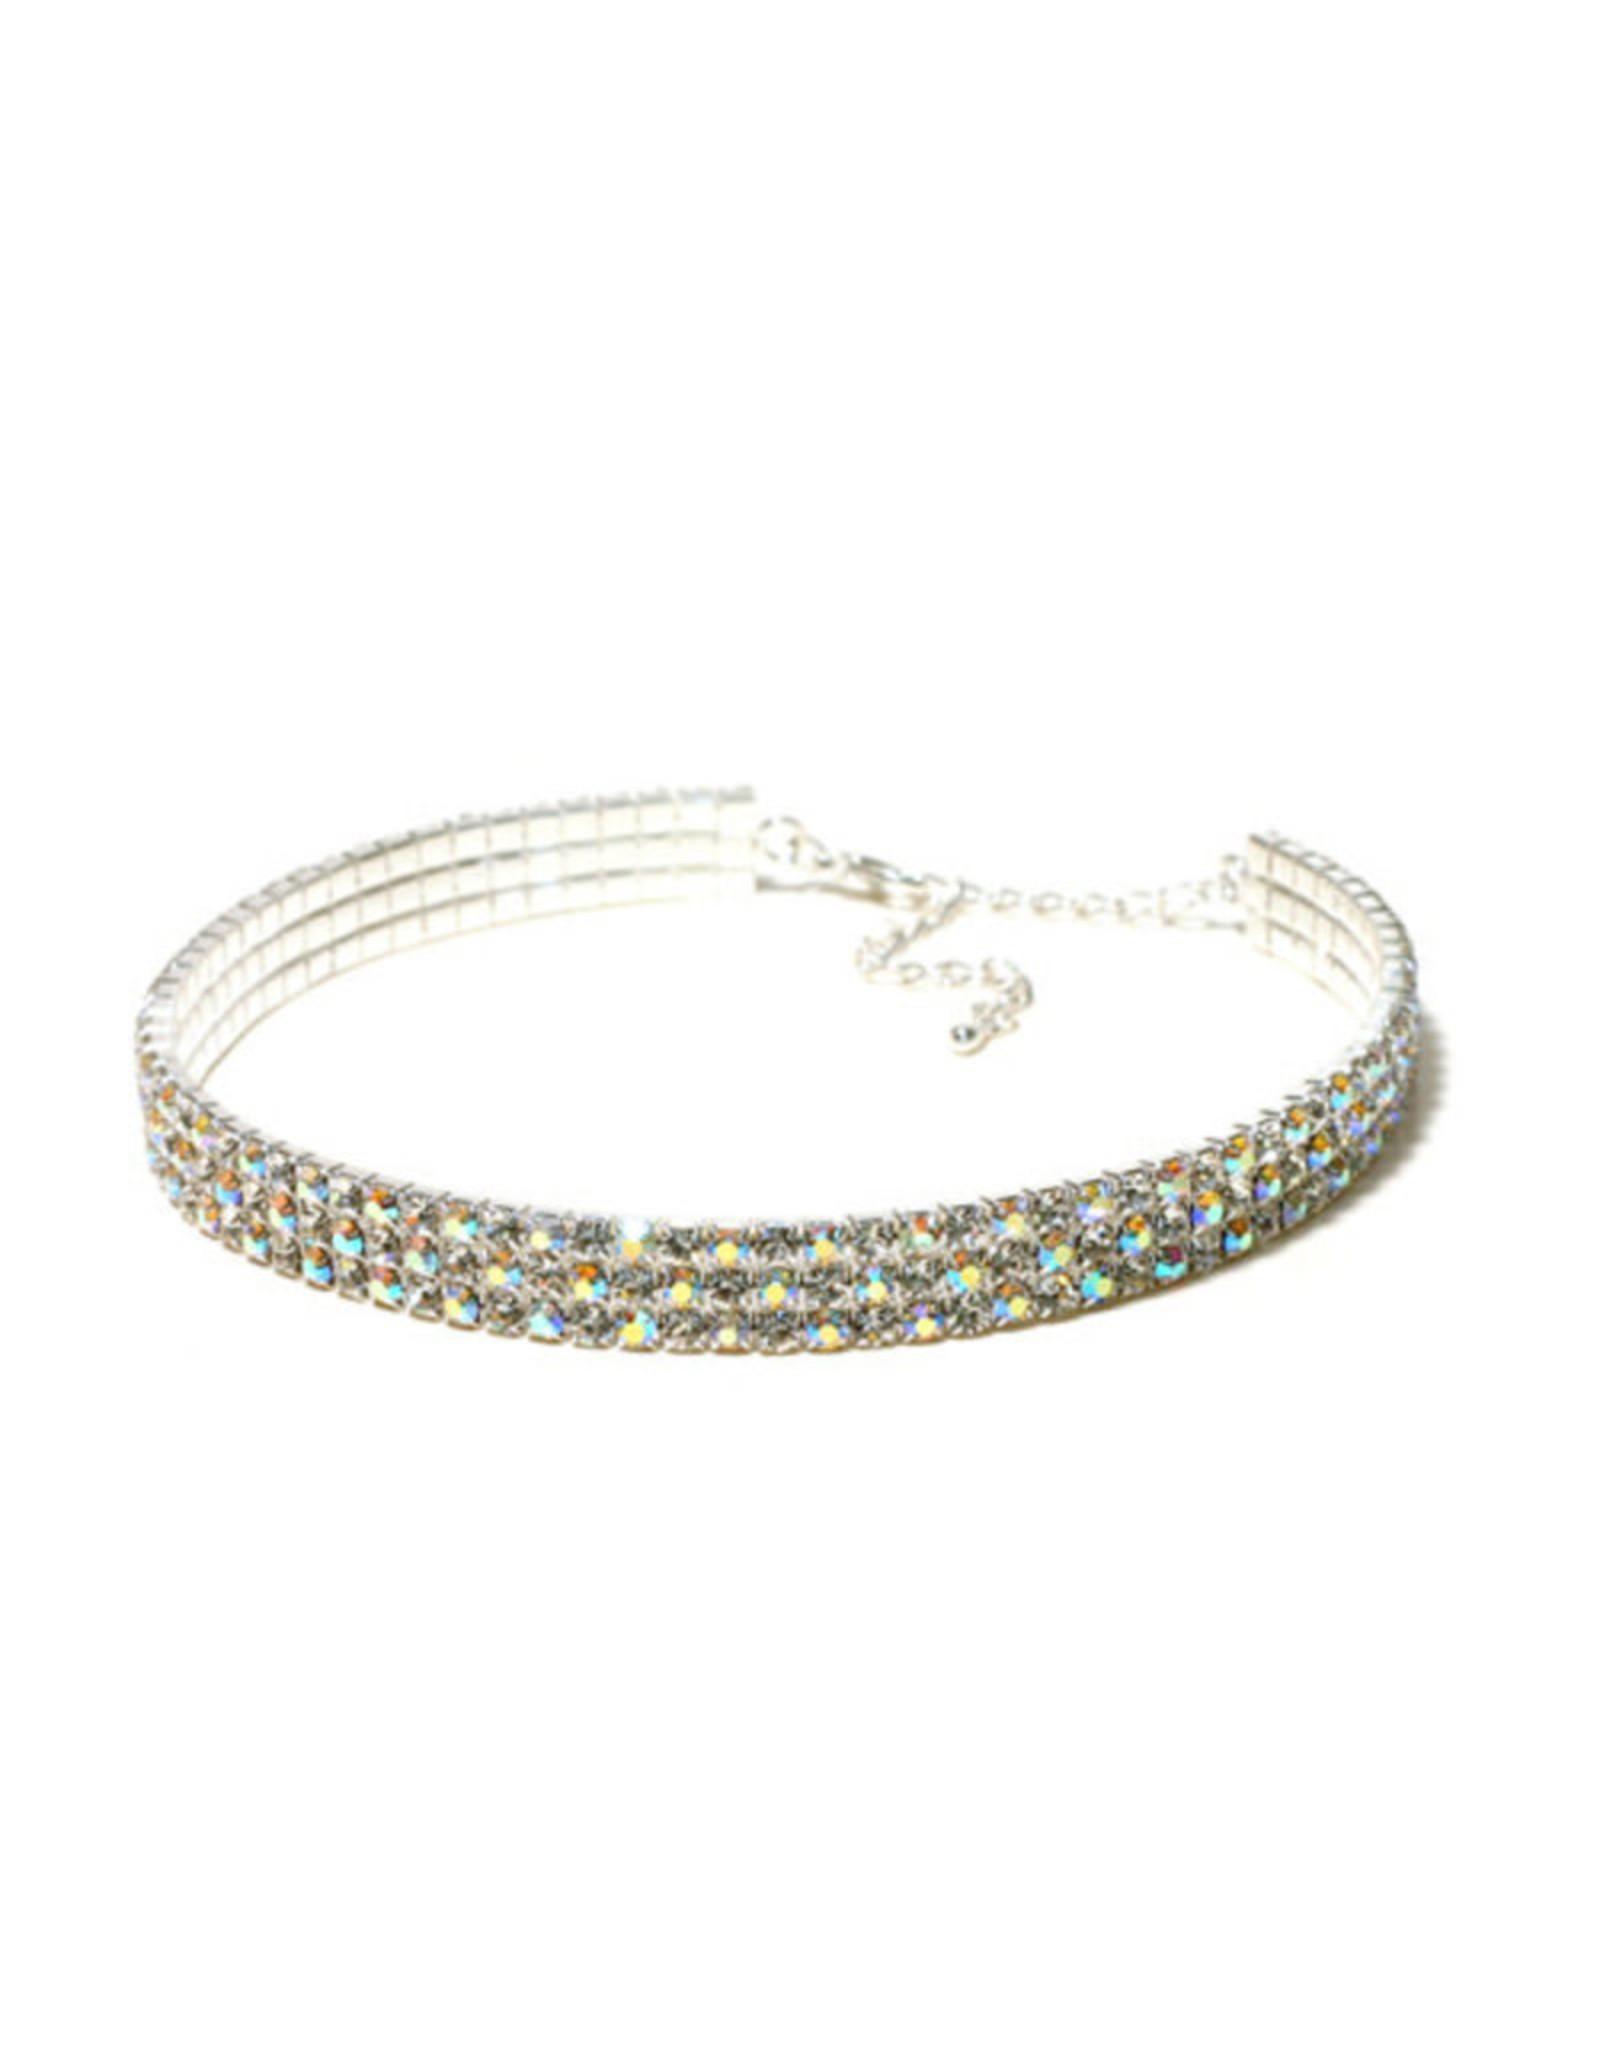 FH2 Necklace AZ0026